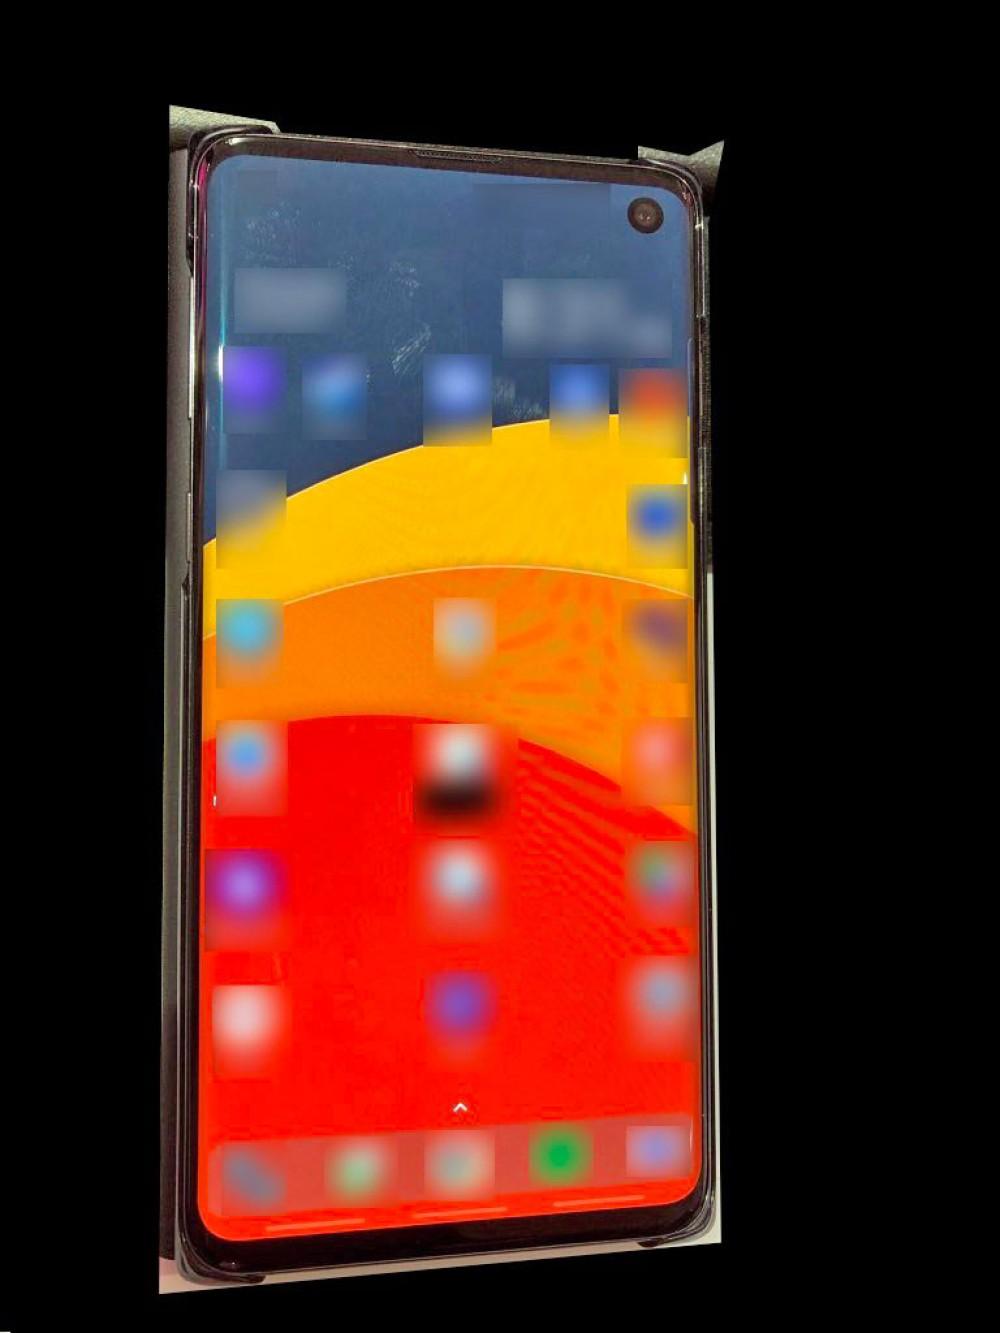 Samsung Galaxy S10: Αυτό είναι το standard μοντέλο σύμφωνα με τον Evan Blass